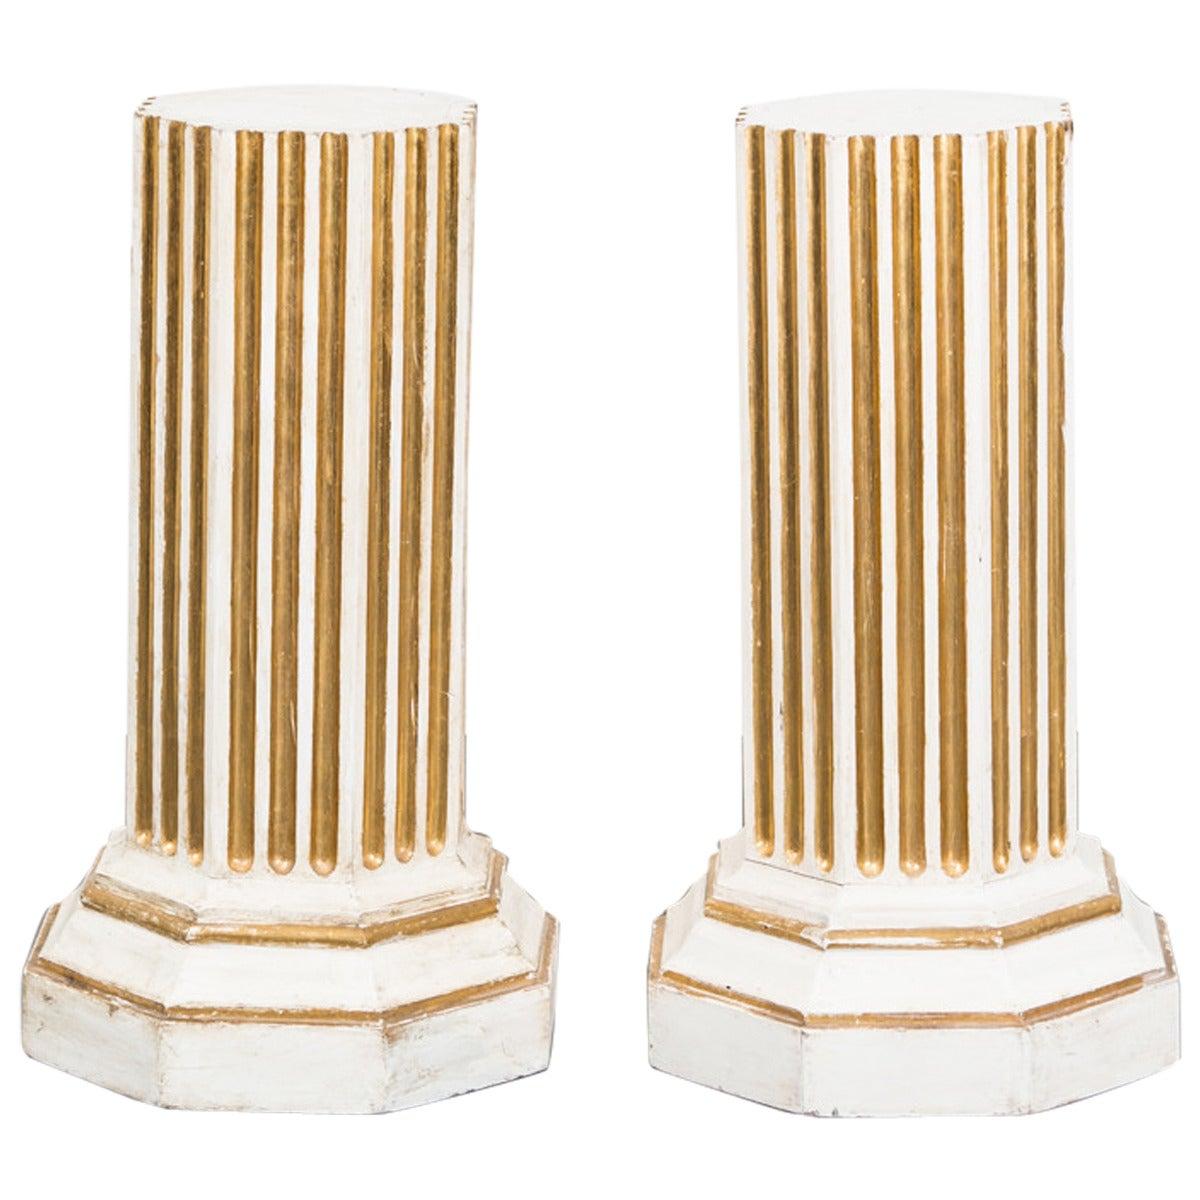 A pair of 18th Century Gustvian Pedestals Sweden